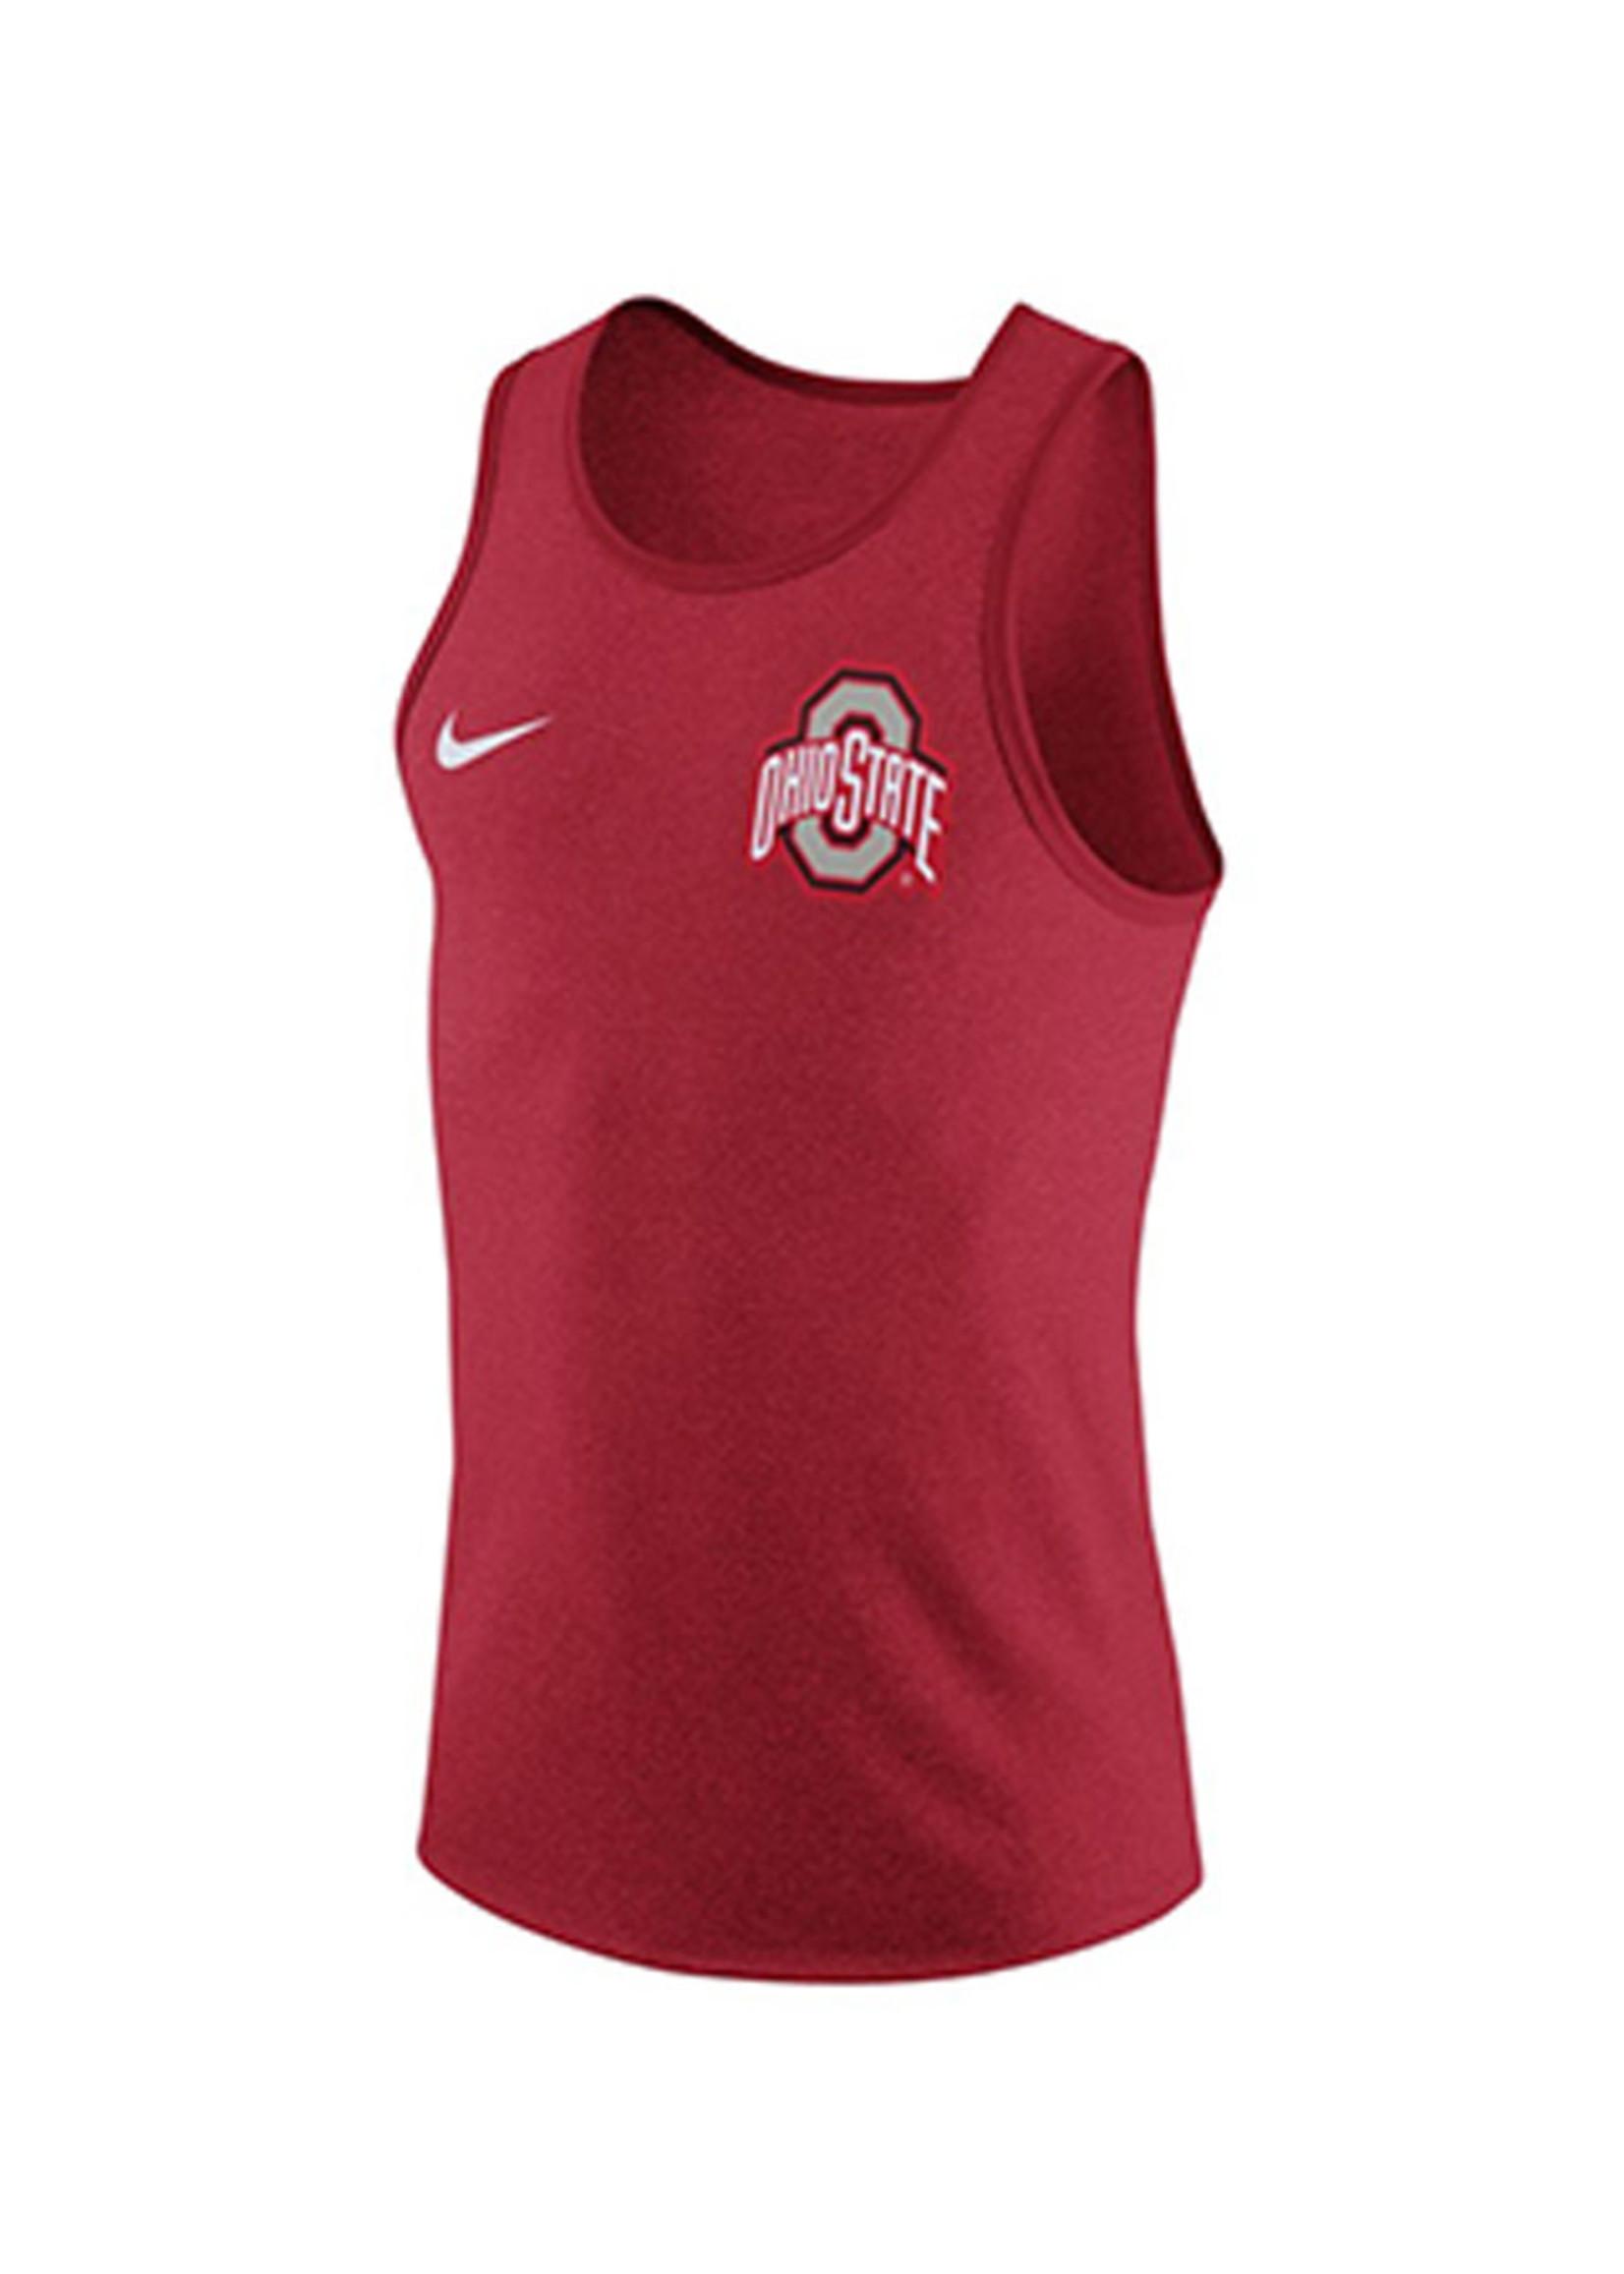 Nike Ohio State University Red Marled Tank